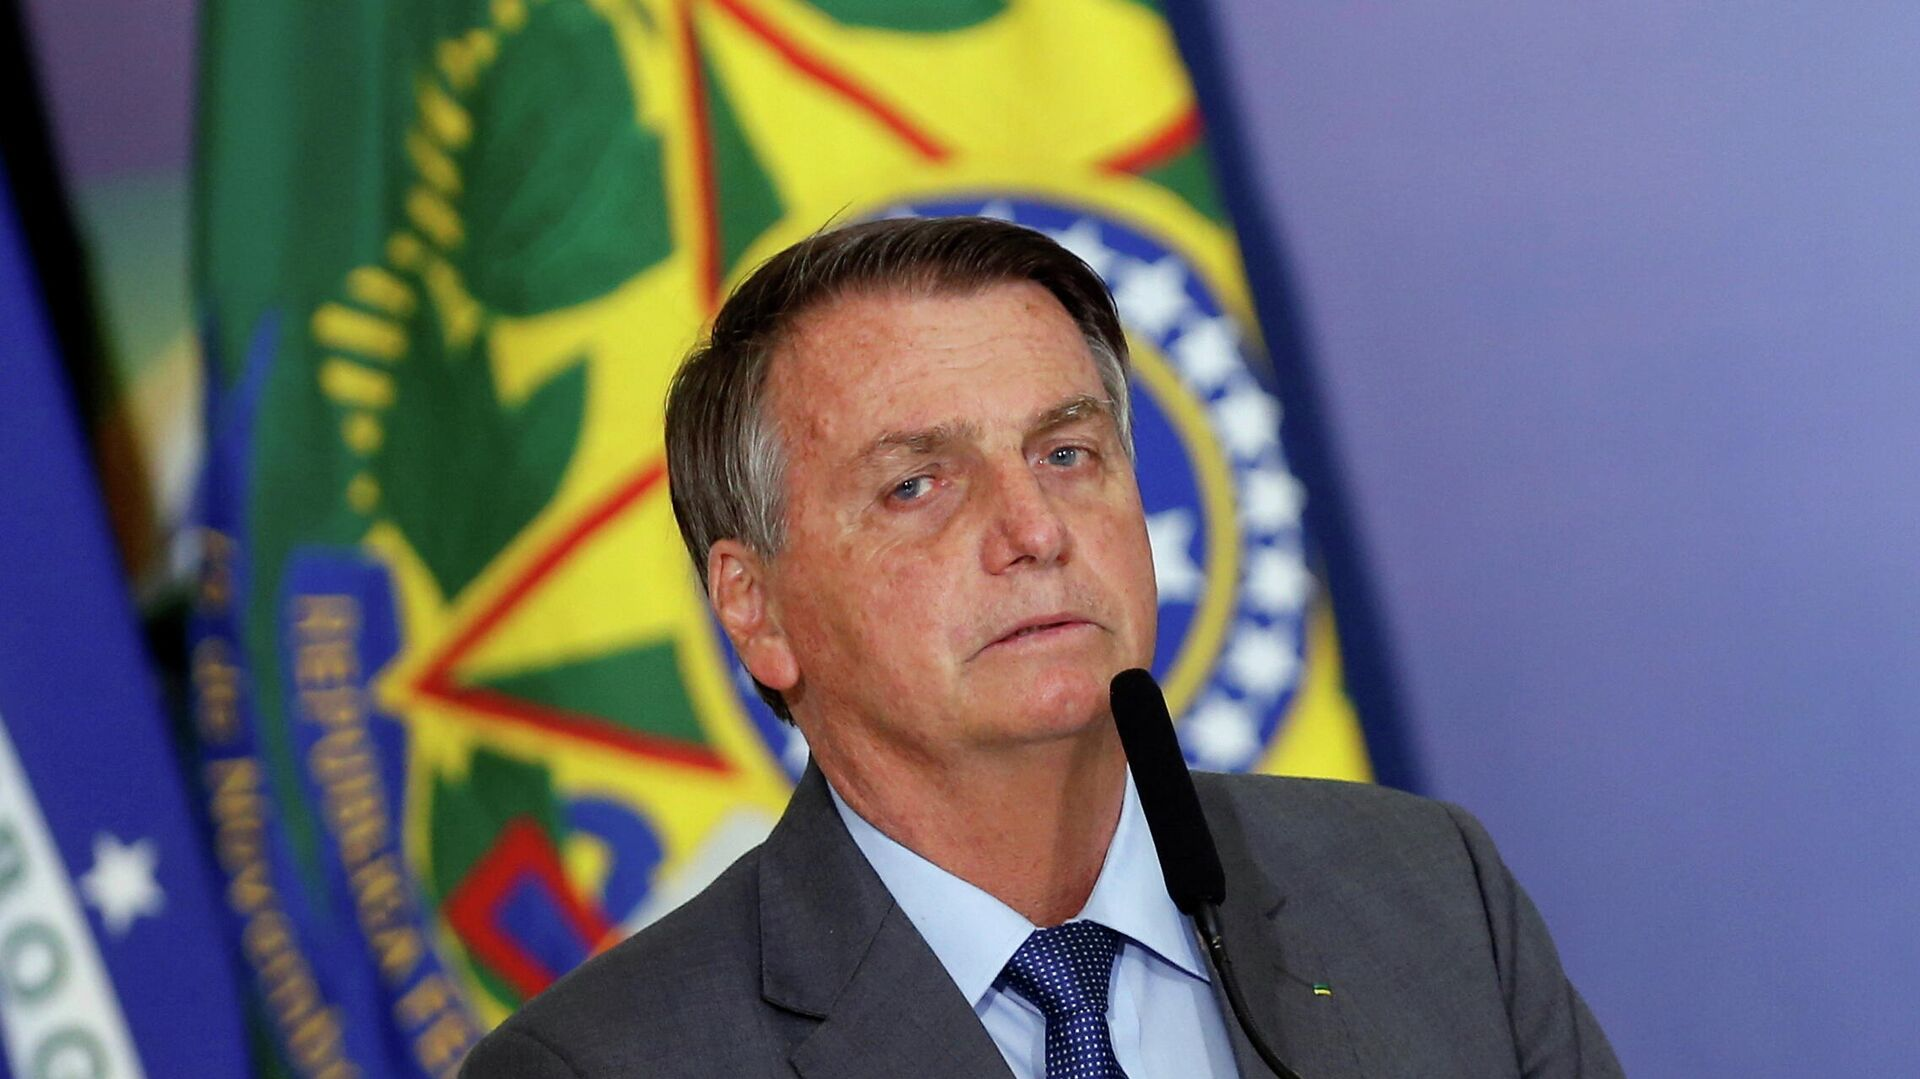 Jair Bolsonaro, presidente de Brasil - Sputnik Mundo, 1920, 04.08.2021